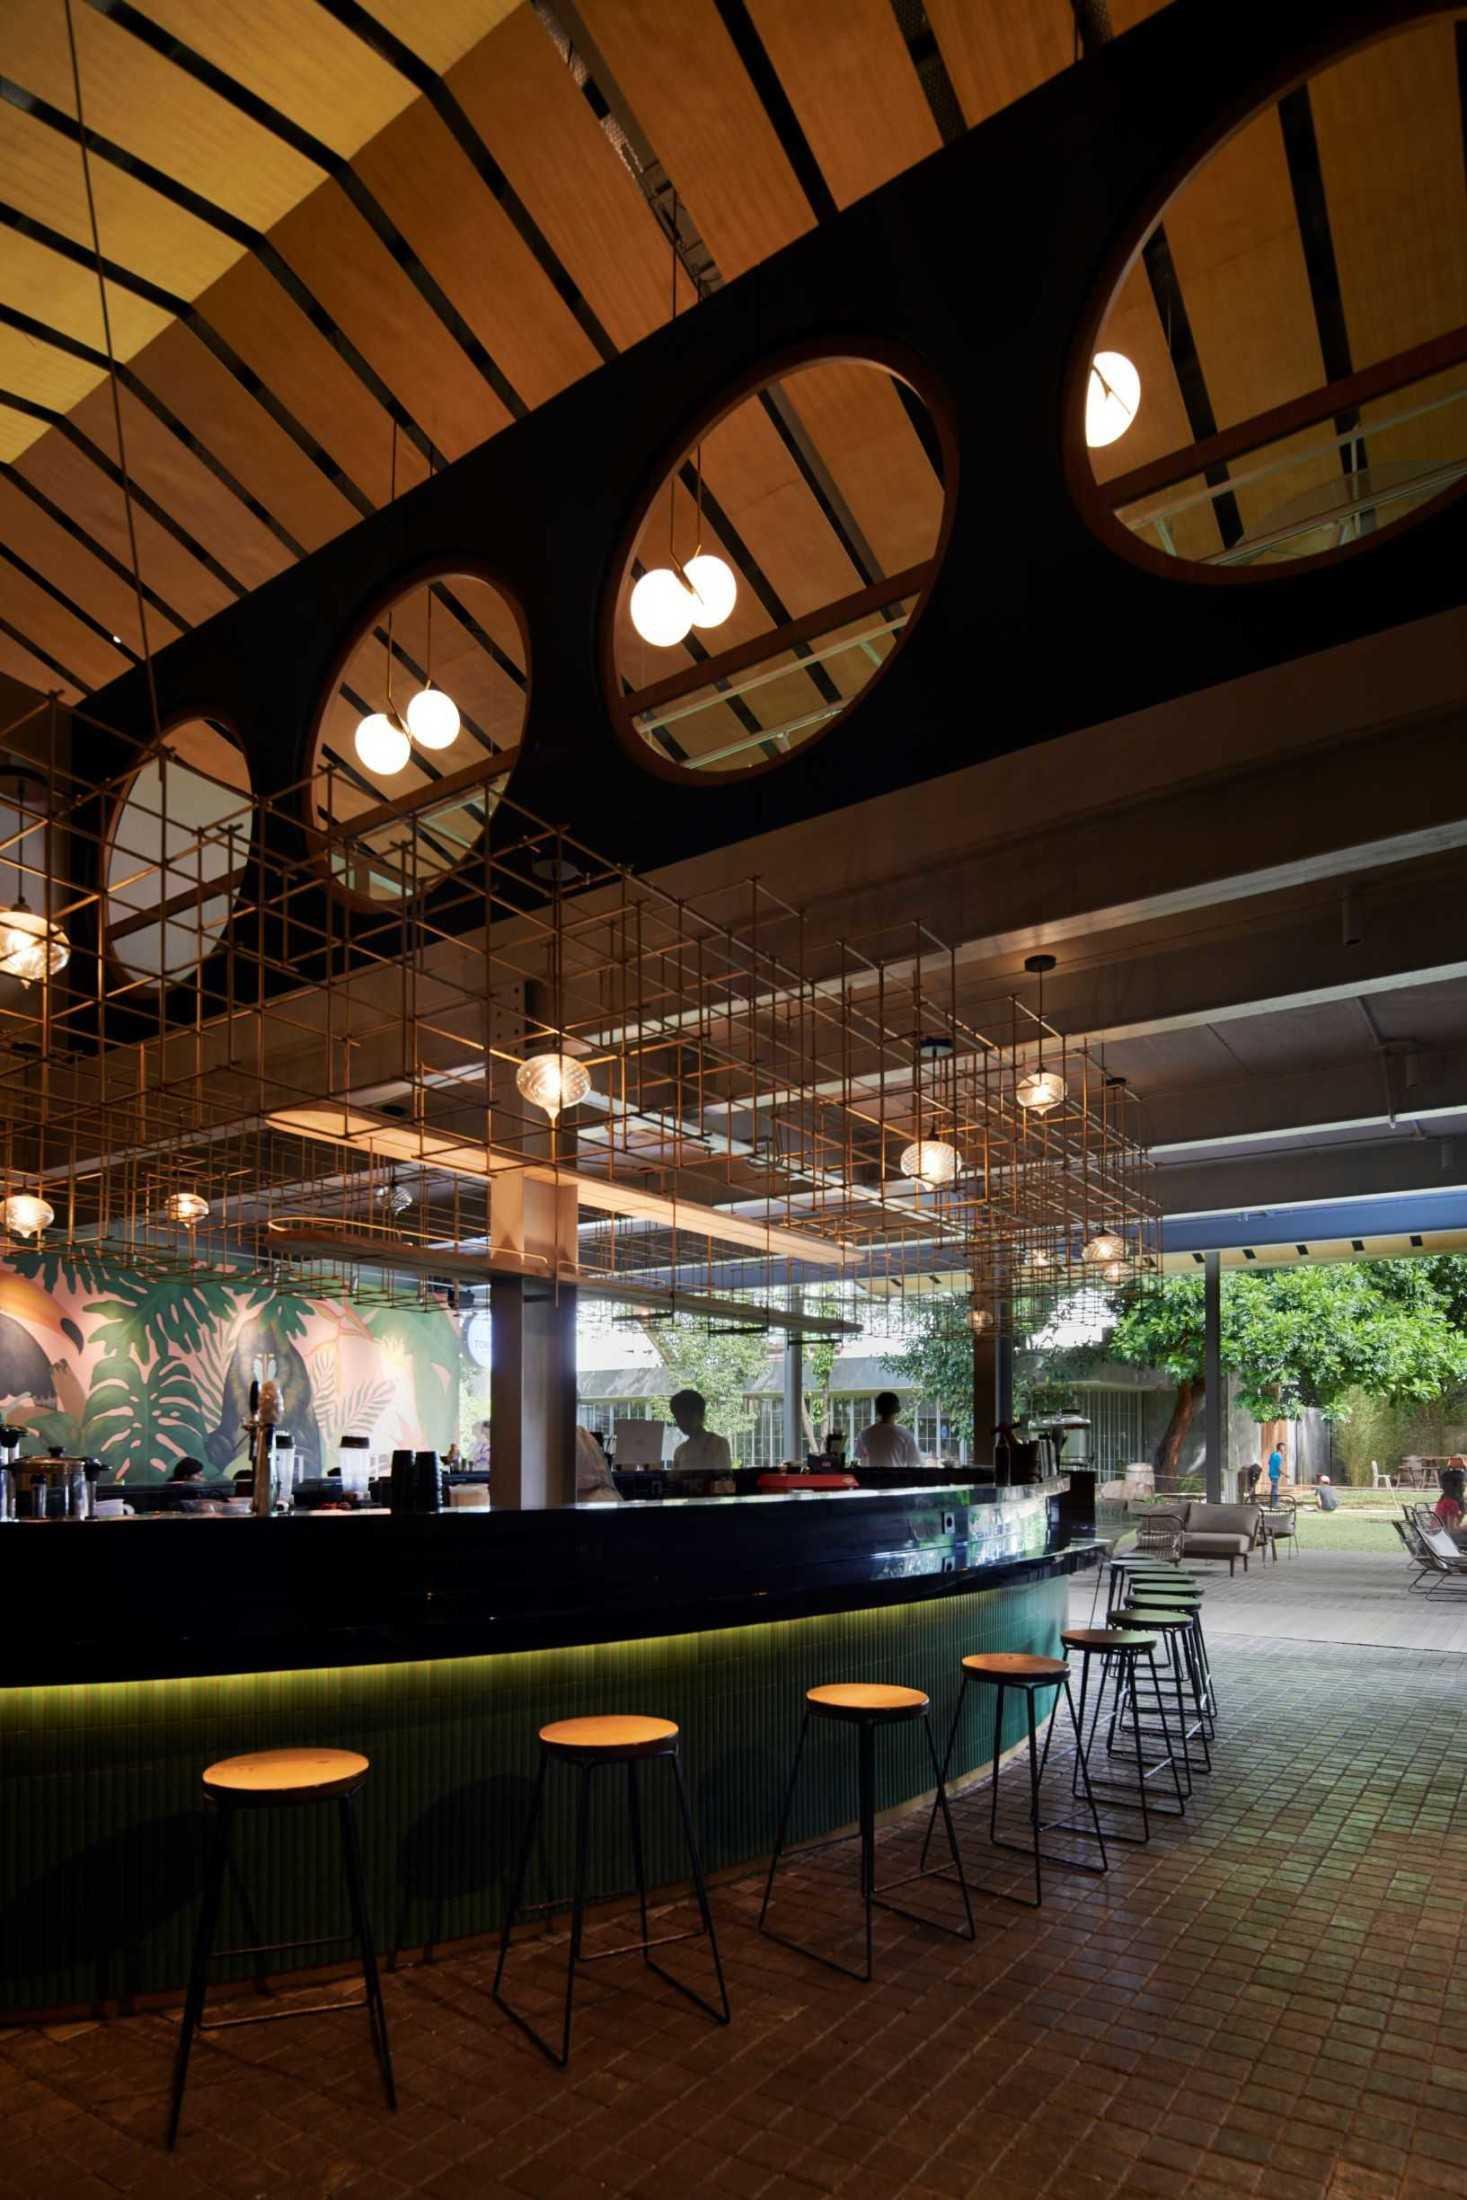 Hadivincent Architects Oval Bar Ciumbuleuit, Cidadap, Kota Bandung, Jawa Barat, Indonesia Ciumbuleuit, Cidadap, Kota Bandung, Jawa Barat, Indonesia Hadivincent-Architects-Oval-Bar  71519